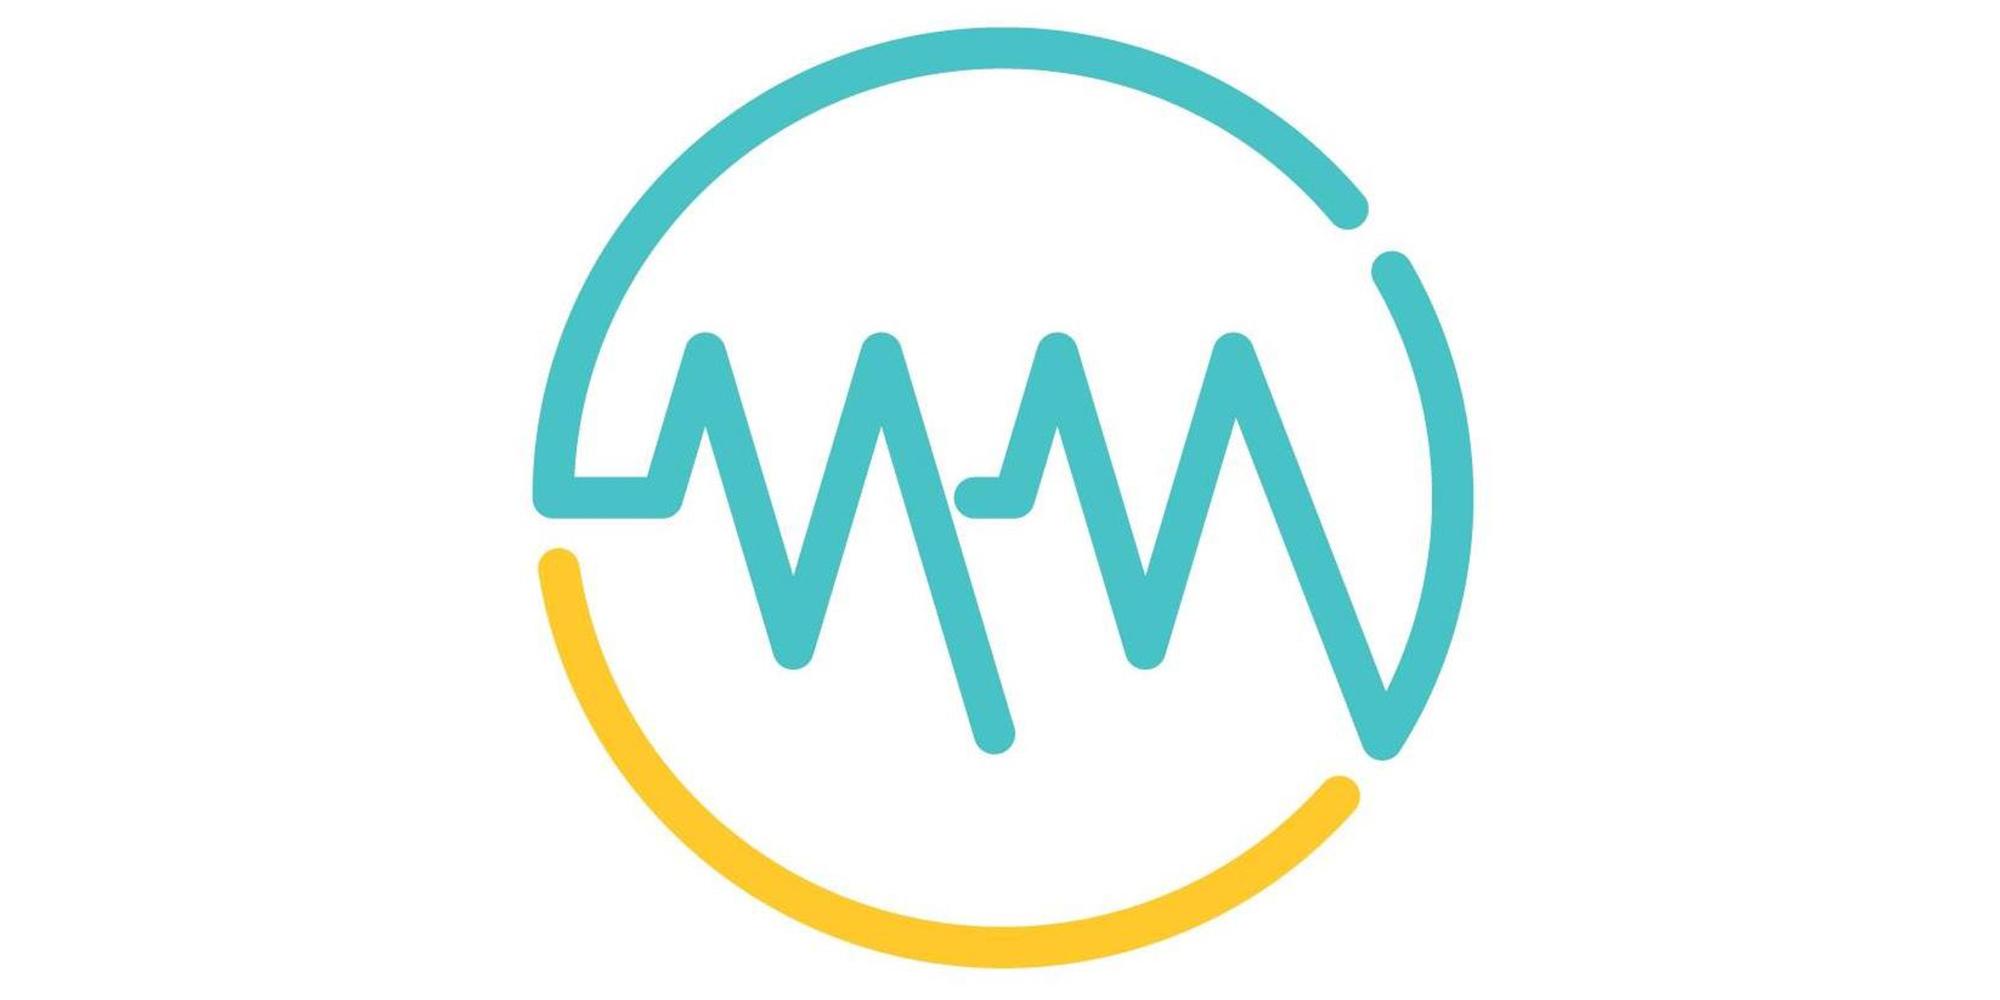 Communication's logo, designed by Luis Perez.